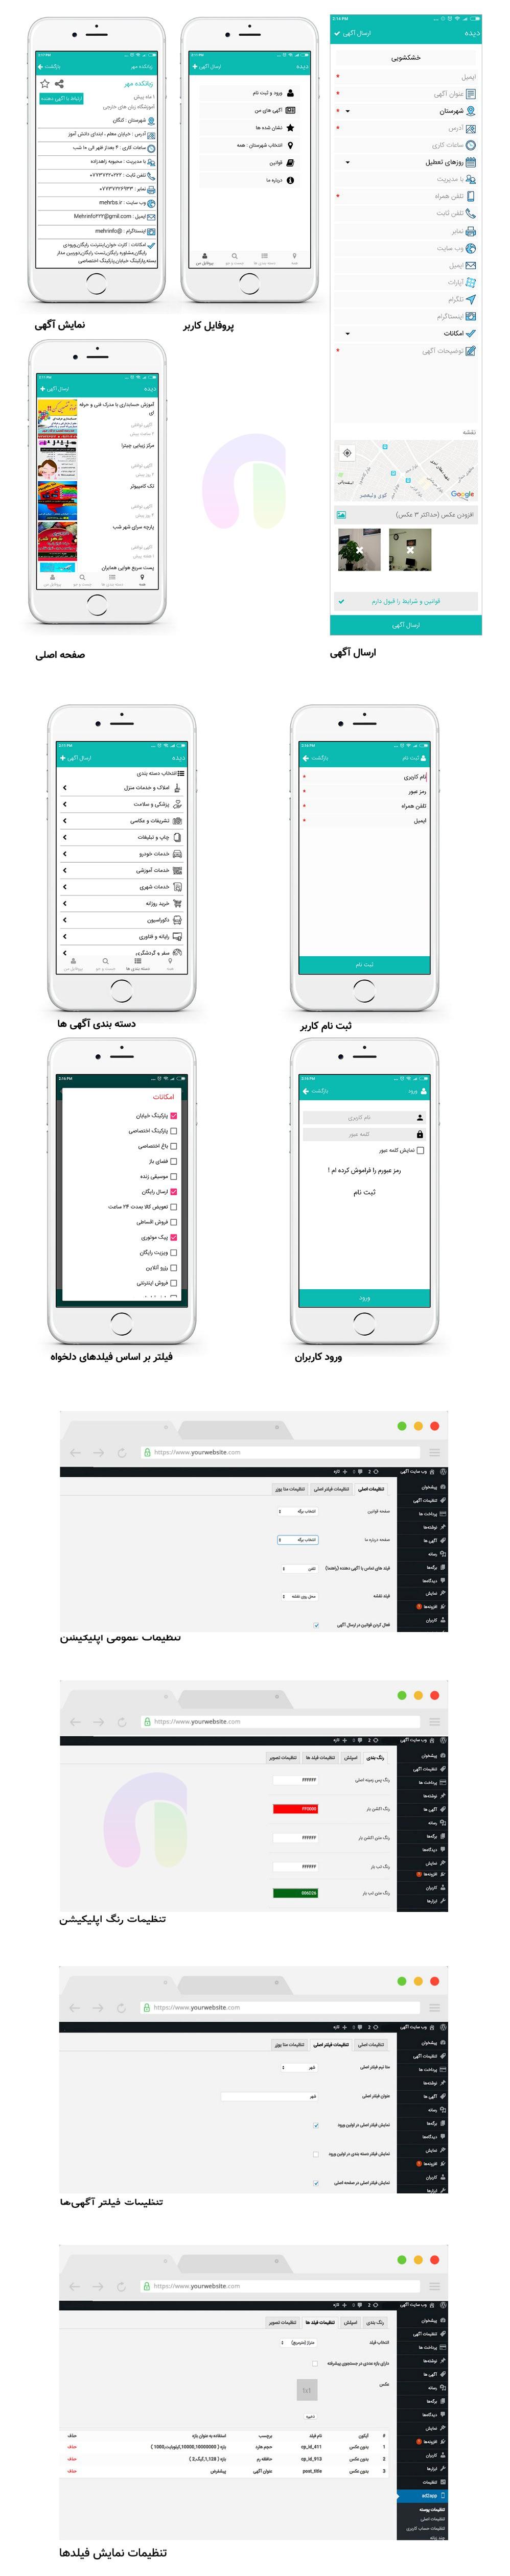 baransite.com apppash.com ad - طراحی سایت و اپلیکیشن آگهی و نیازمندی